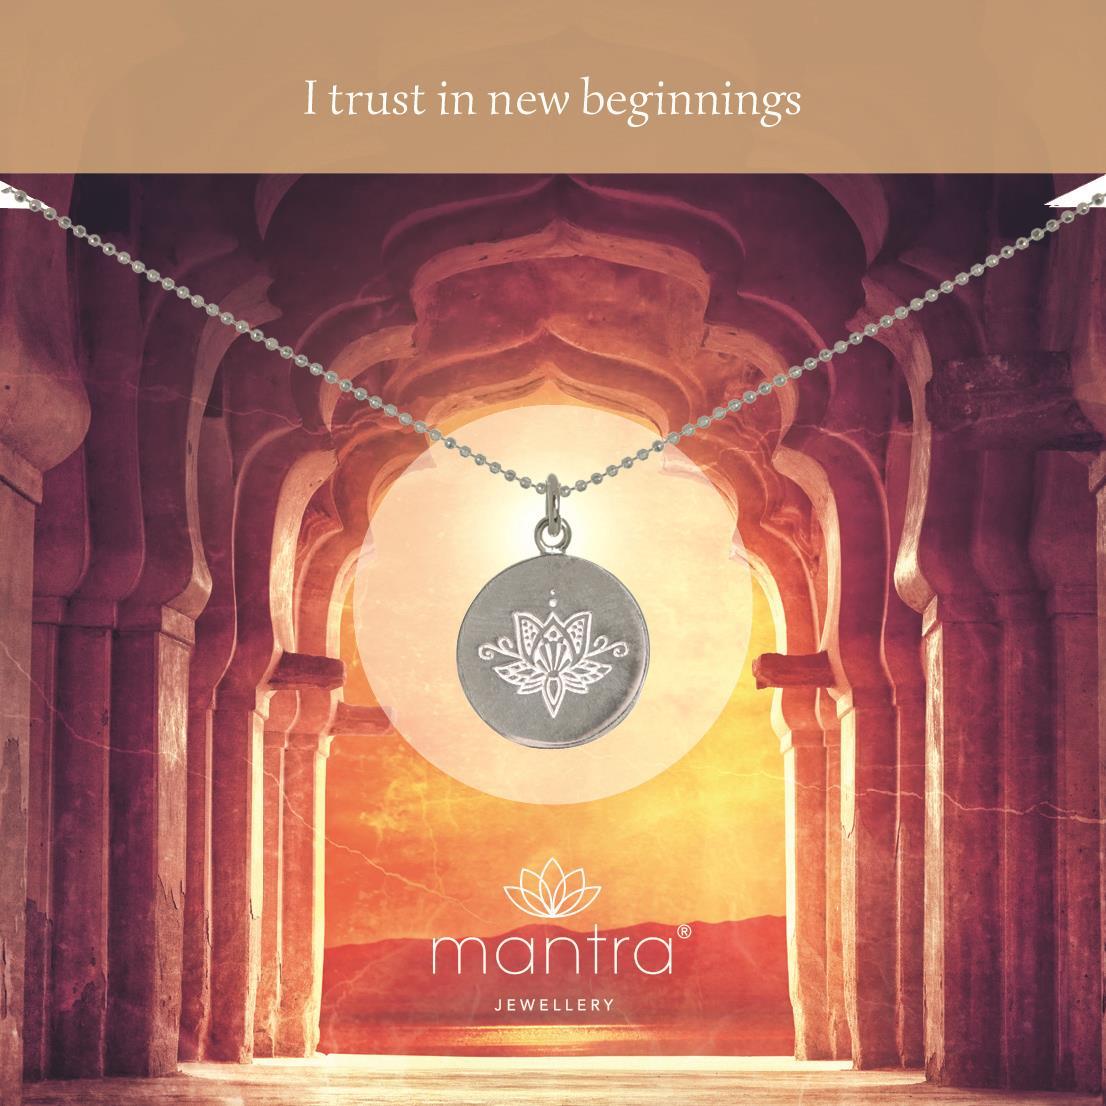 Lotus Flower Necklace New Beginnings Mantra Jewellery